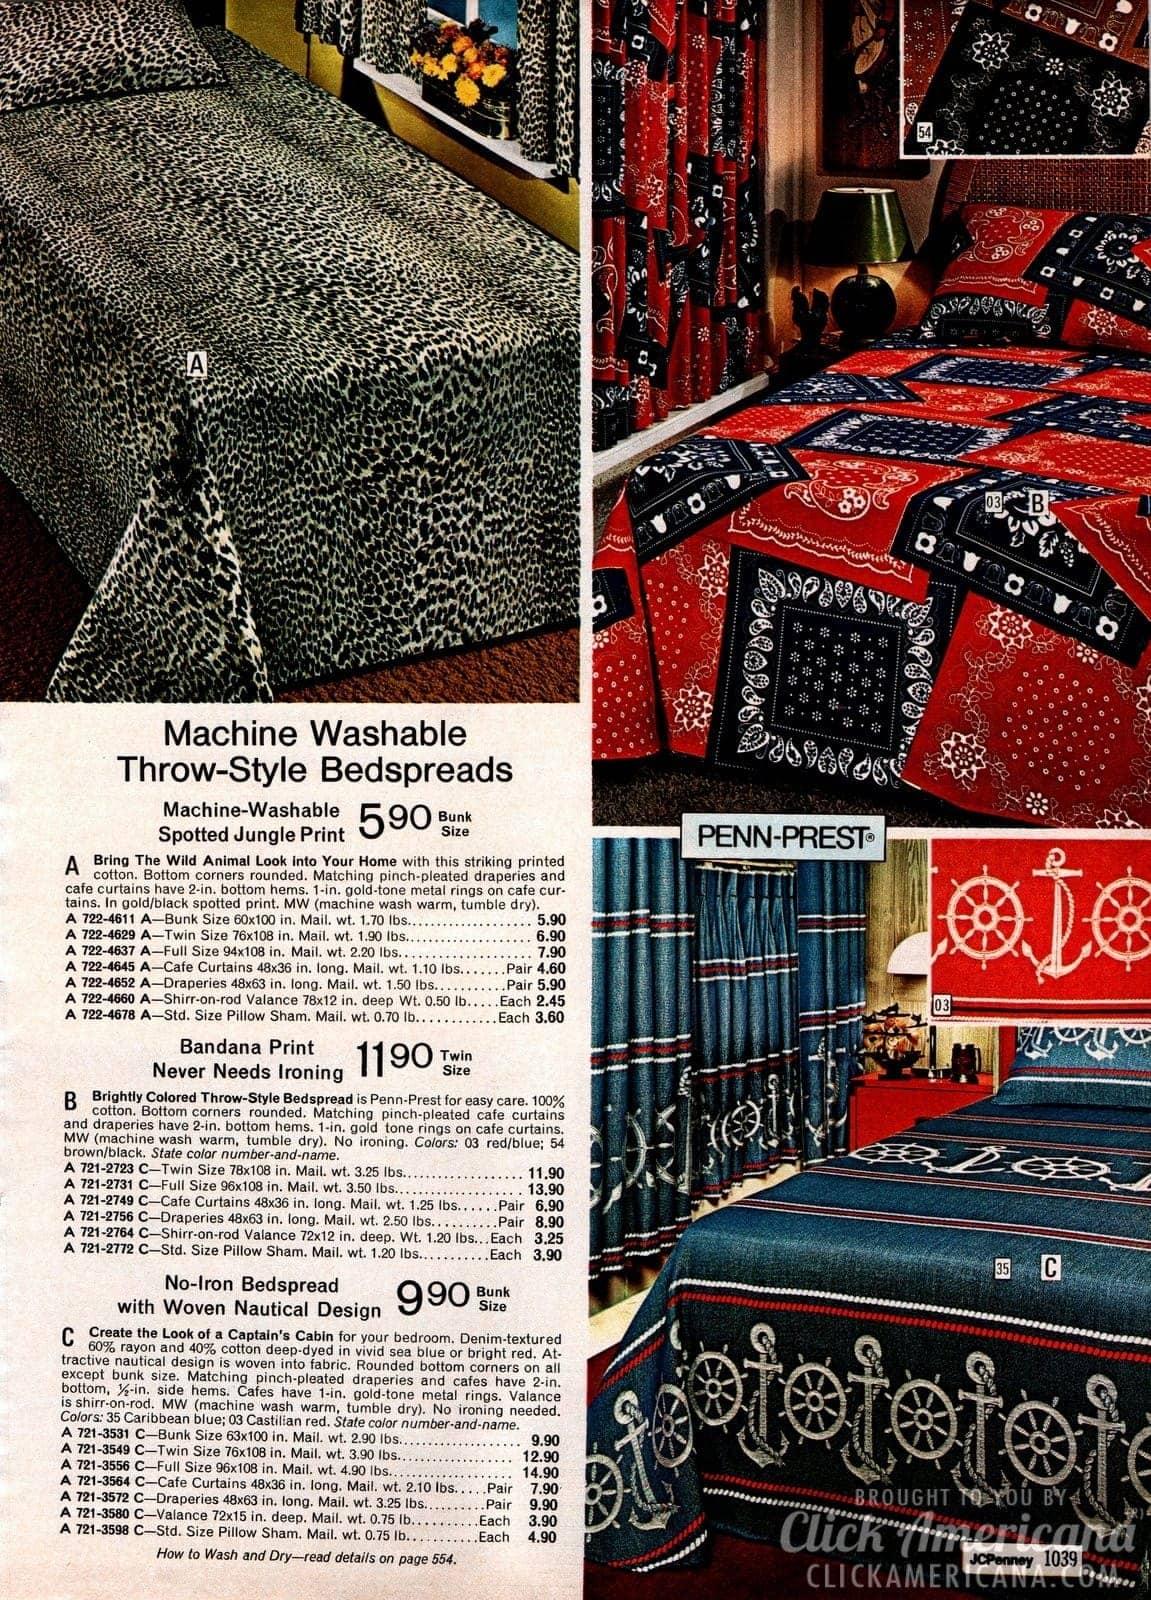 Leopard, bandana print and nautical design throw-style bedspreads